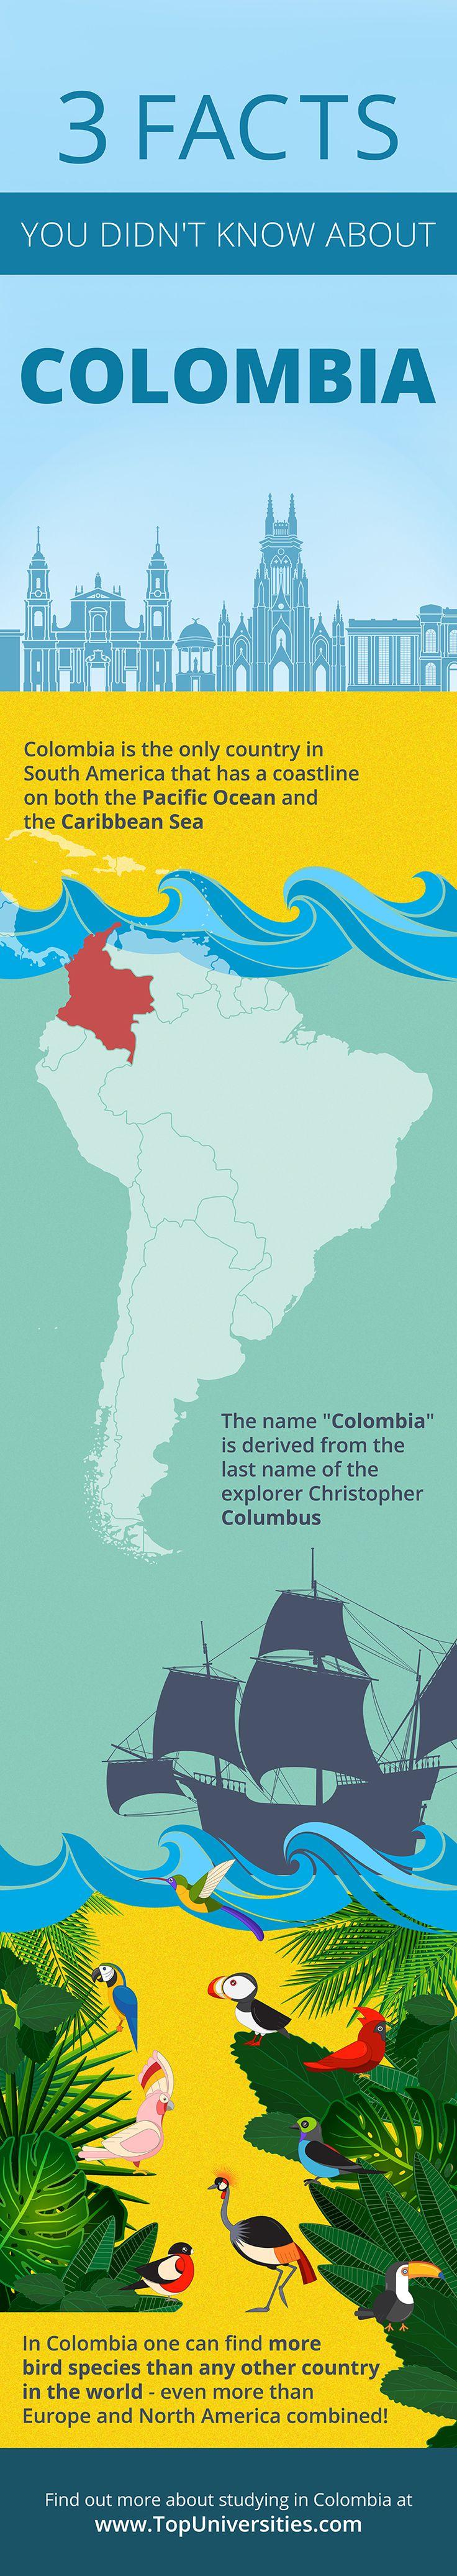 QS Latin American University Rankings 2016 36